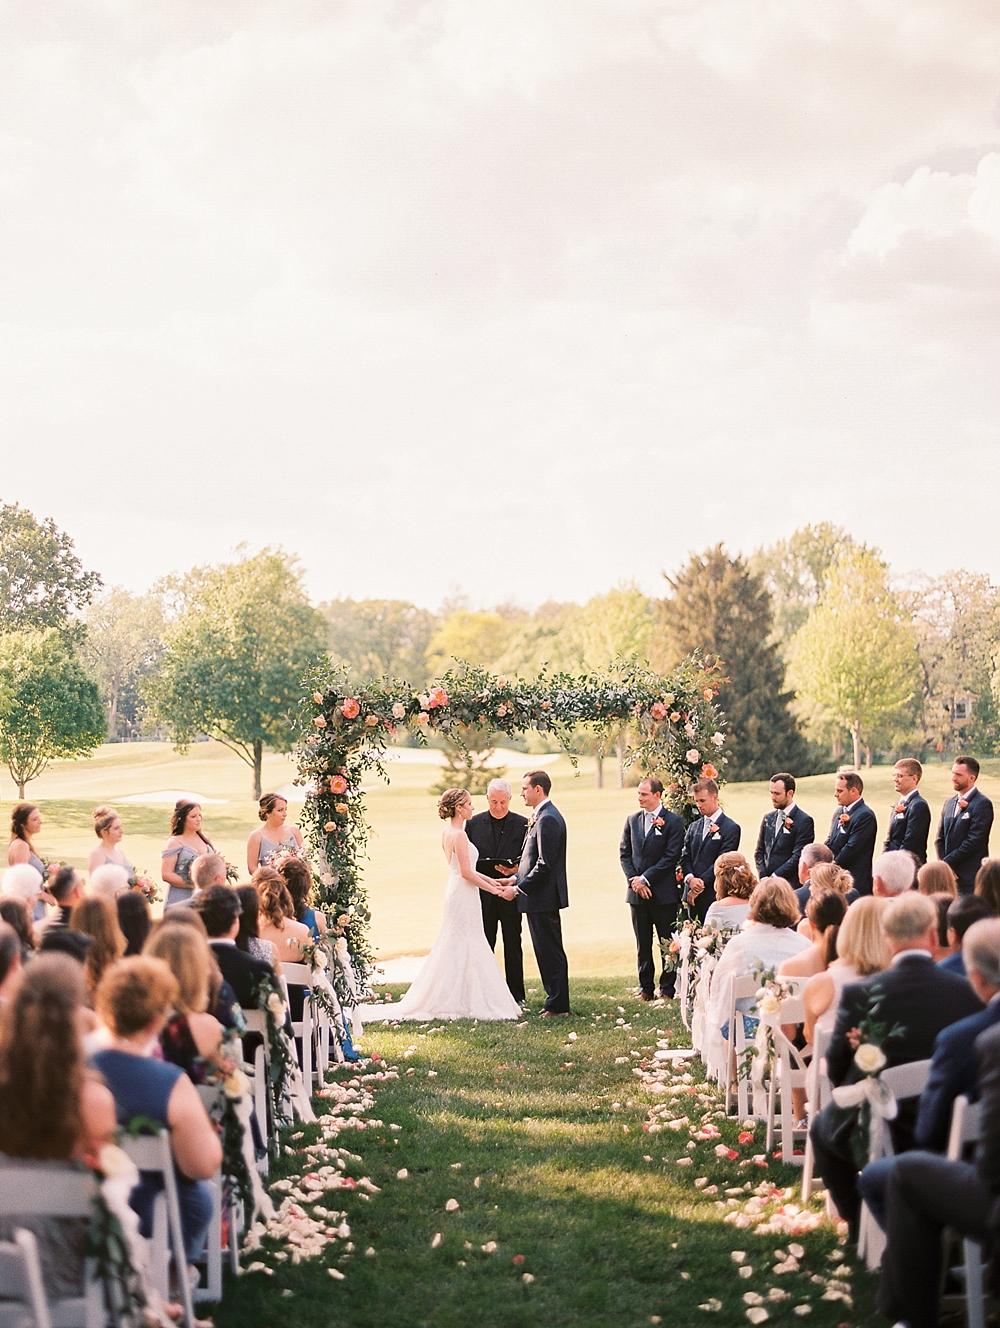 kristin-la-voie-photography-butterfield-country-club-best-chicago-austin-wedding-fine-art-photographer-238